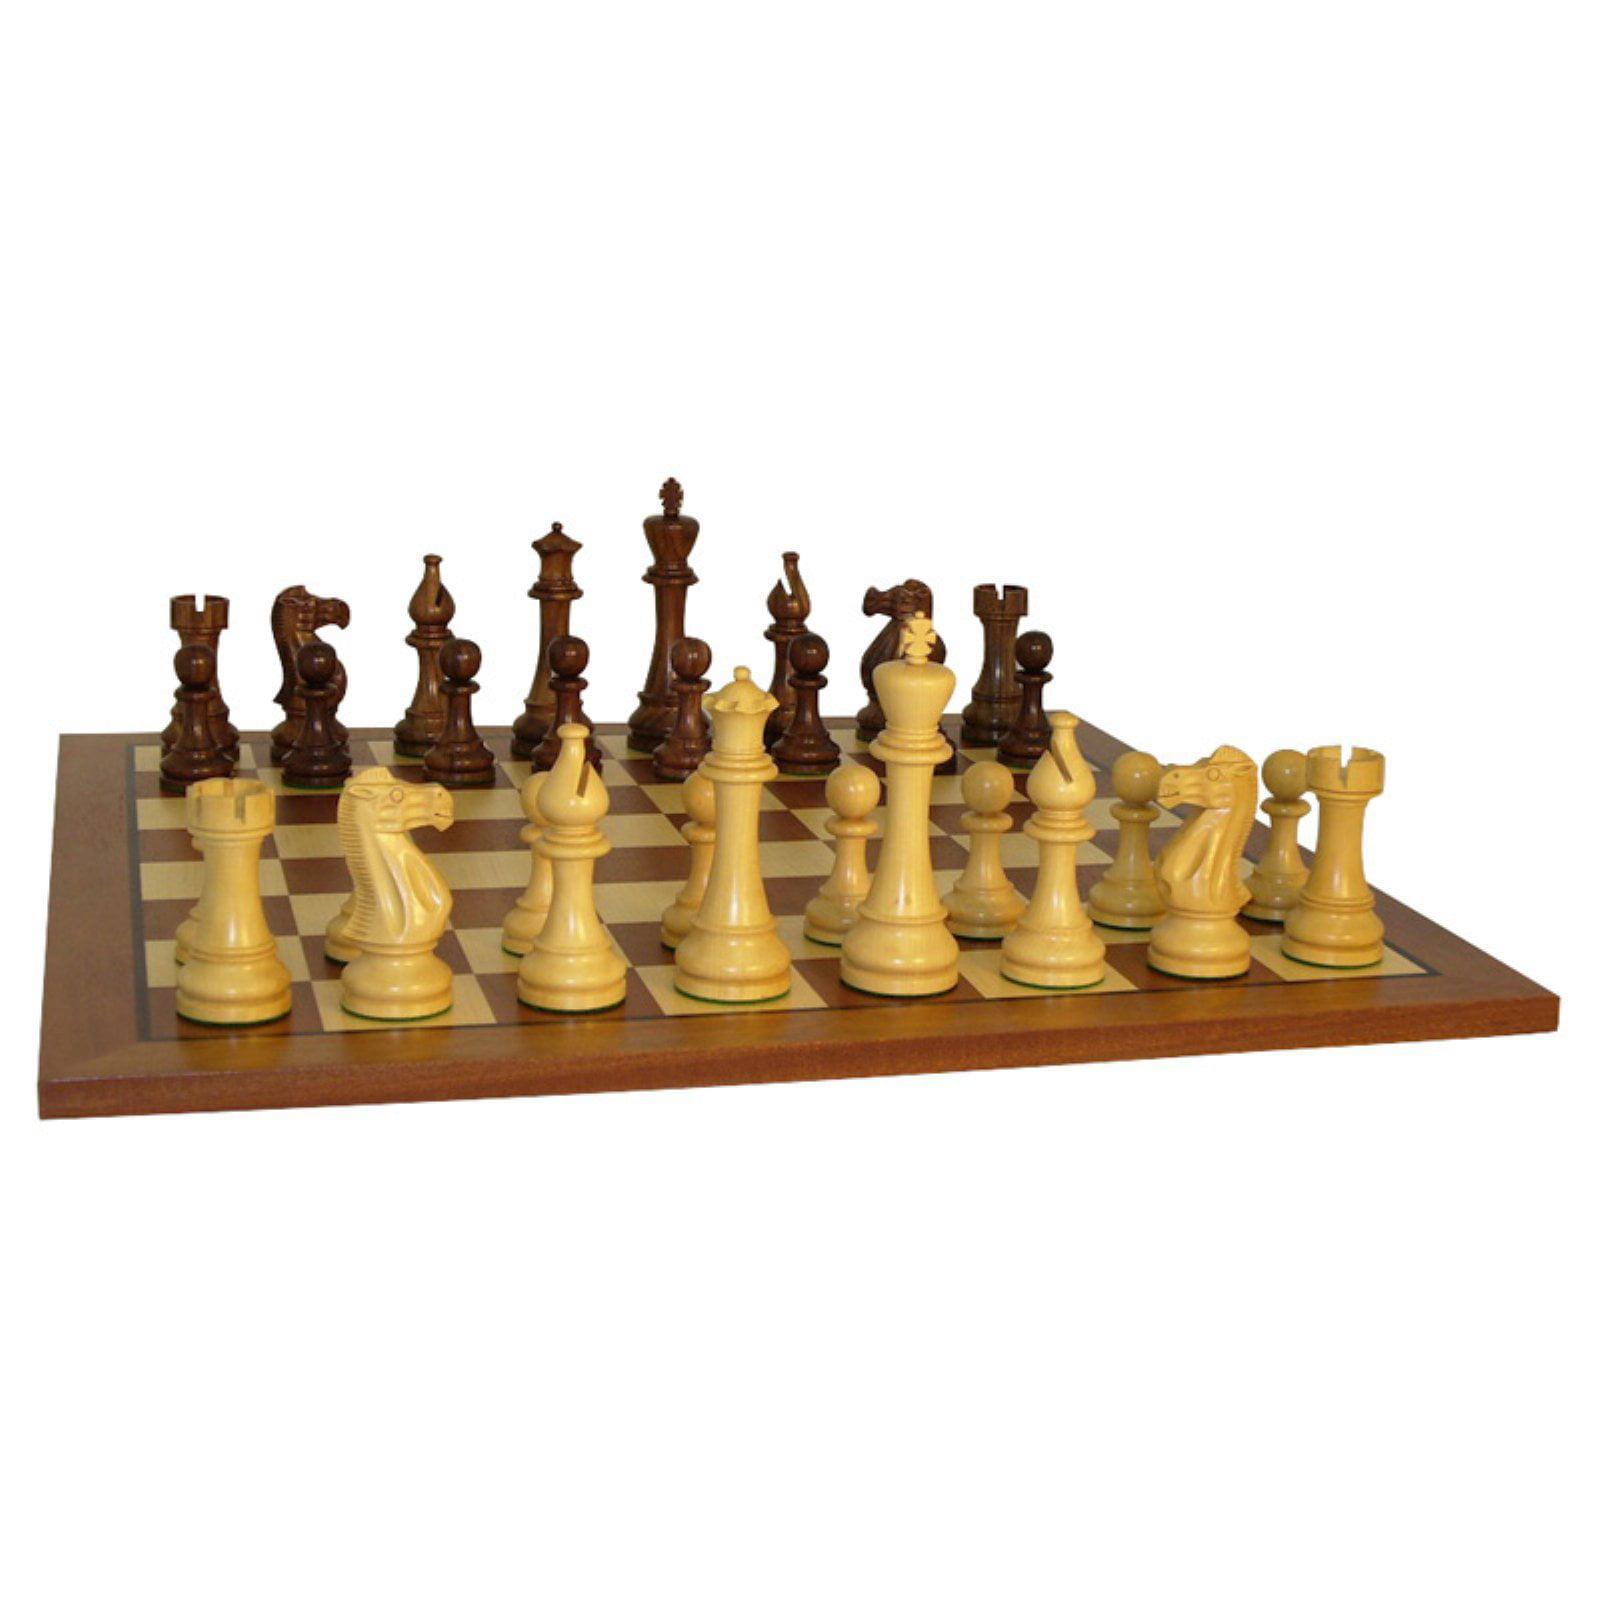 Jumbo Staunton Chess Set on Sapele Board by WorldWise Imports